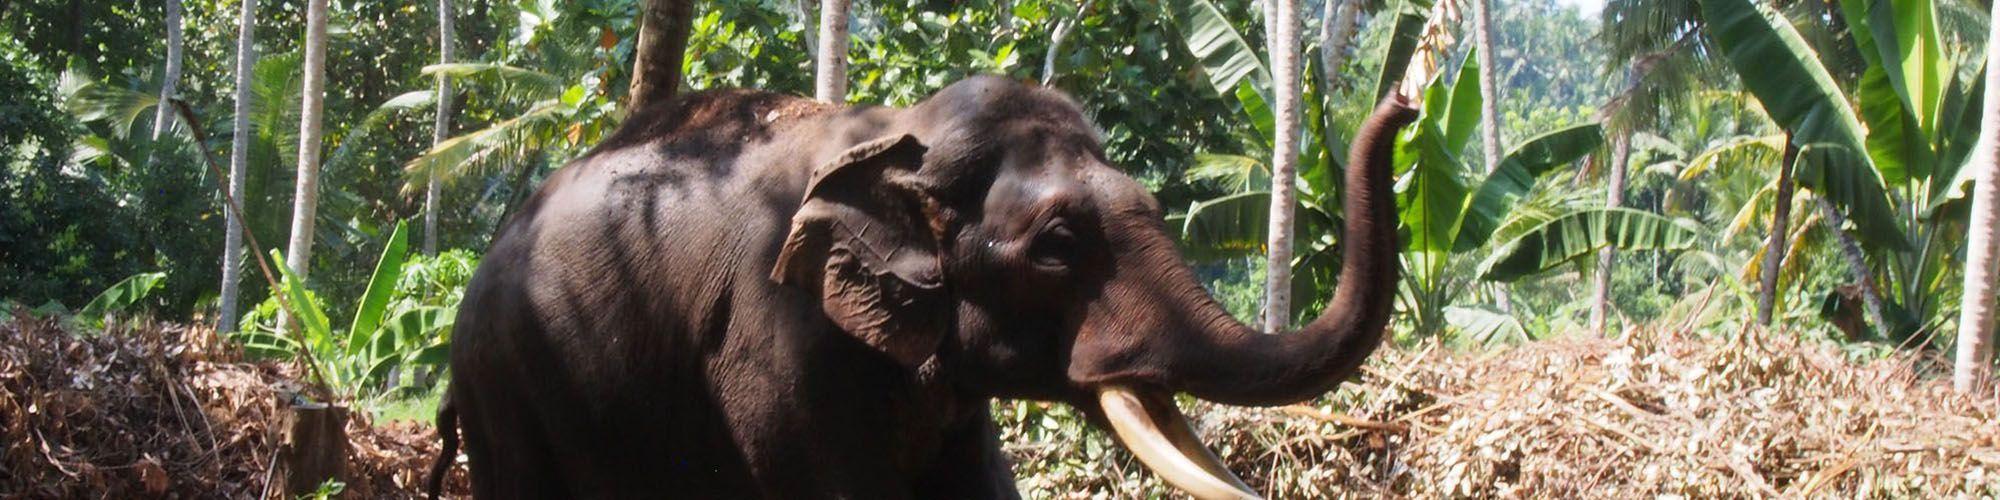 Sri Lanka, Elephant Walking Experience